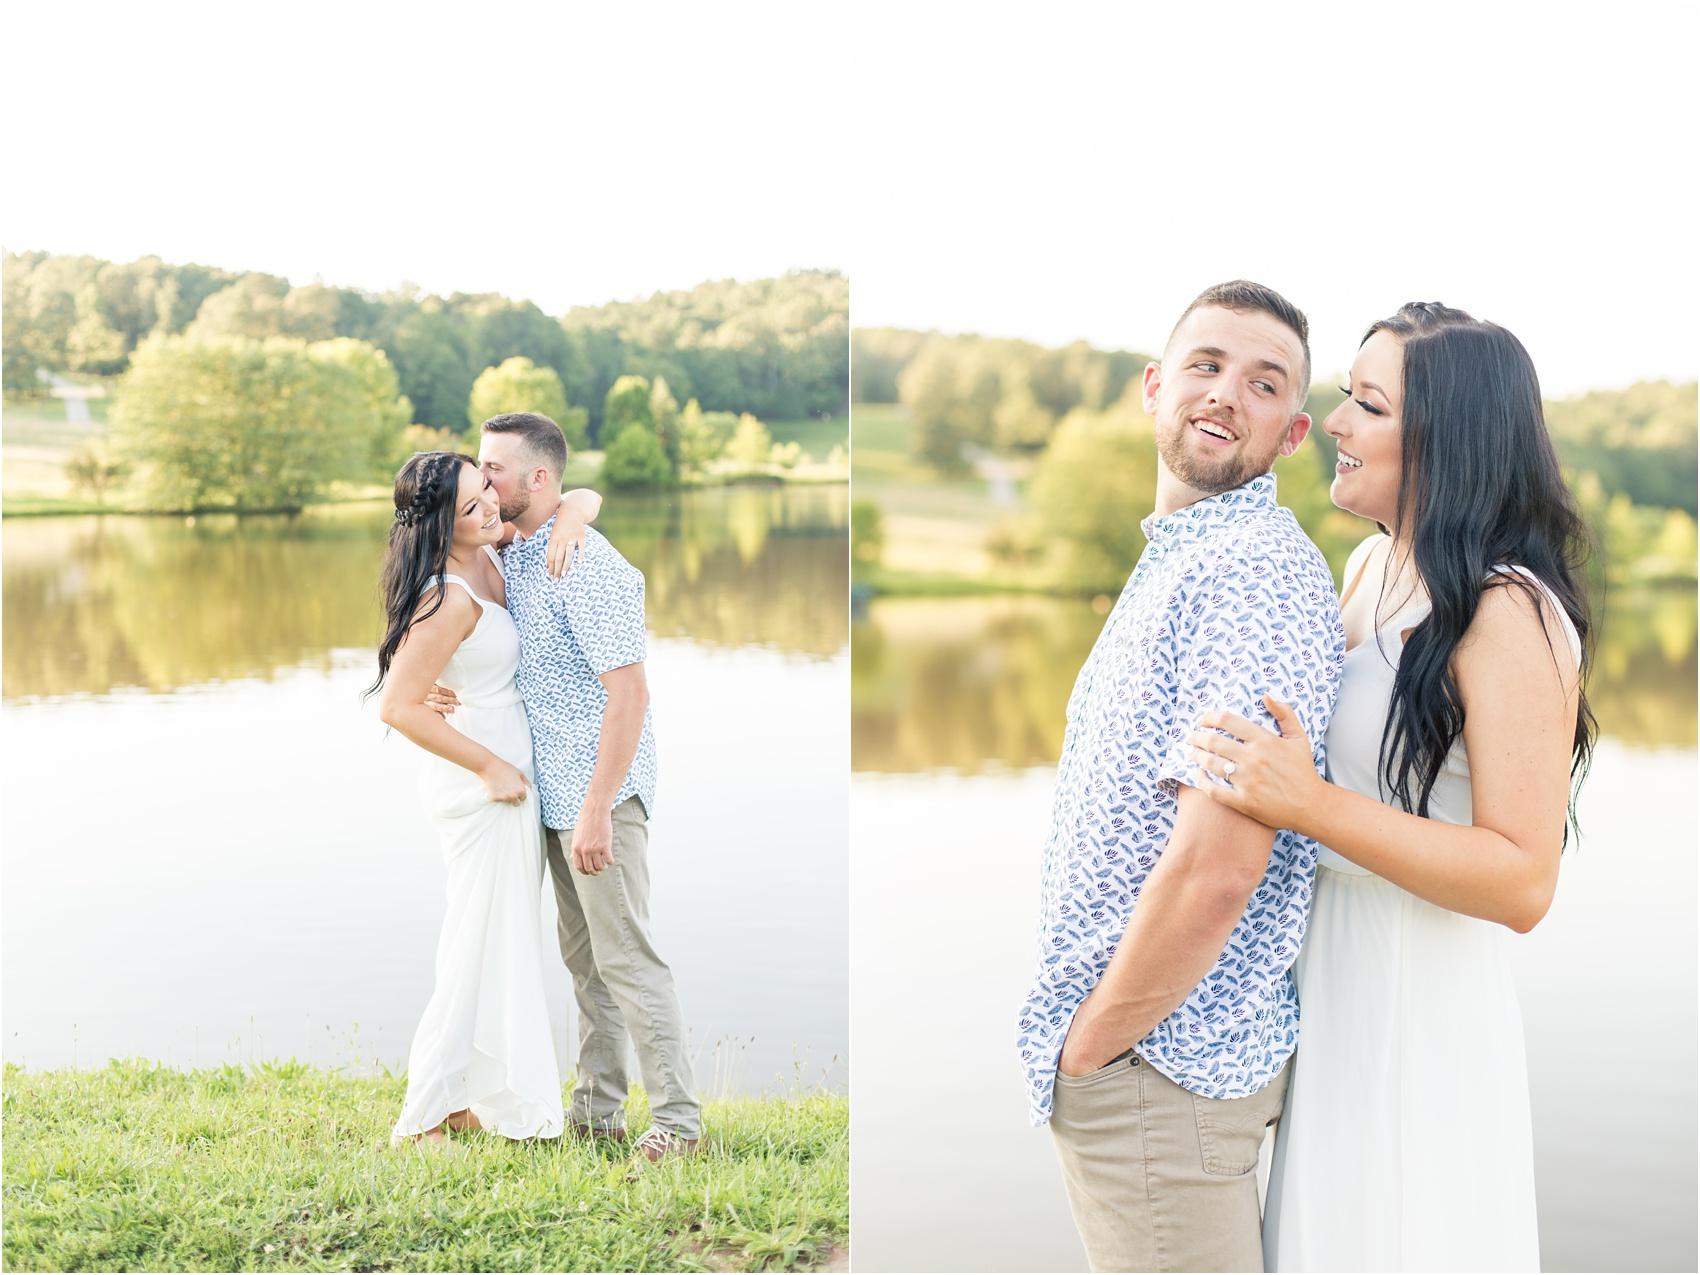 Savannah Eve Photography- Turnbill-Gilgan Engagement Photos-54.jpg